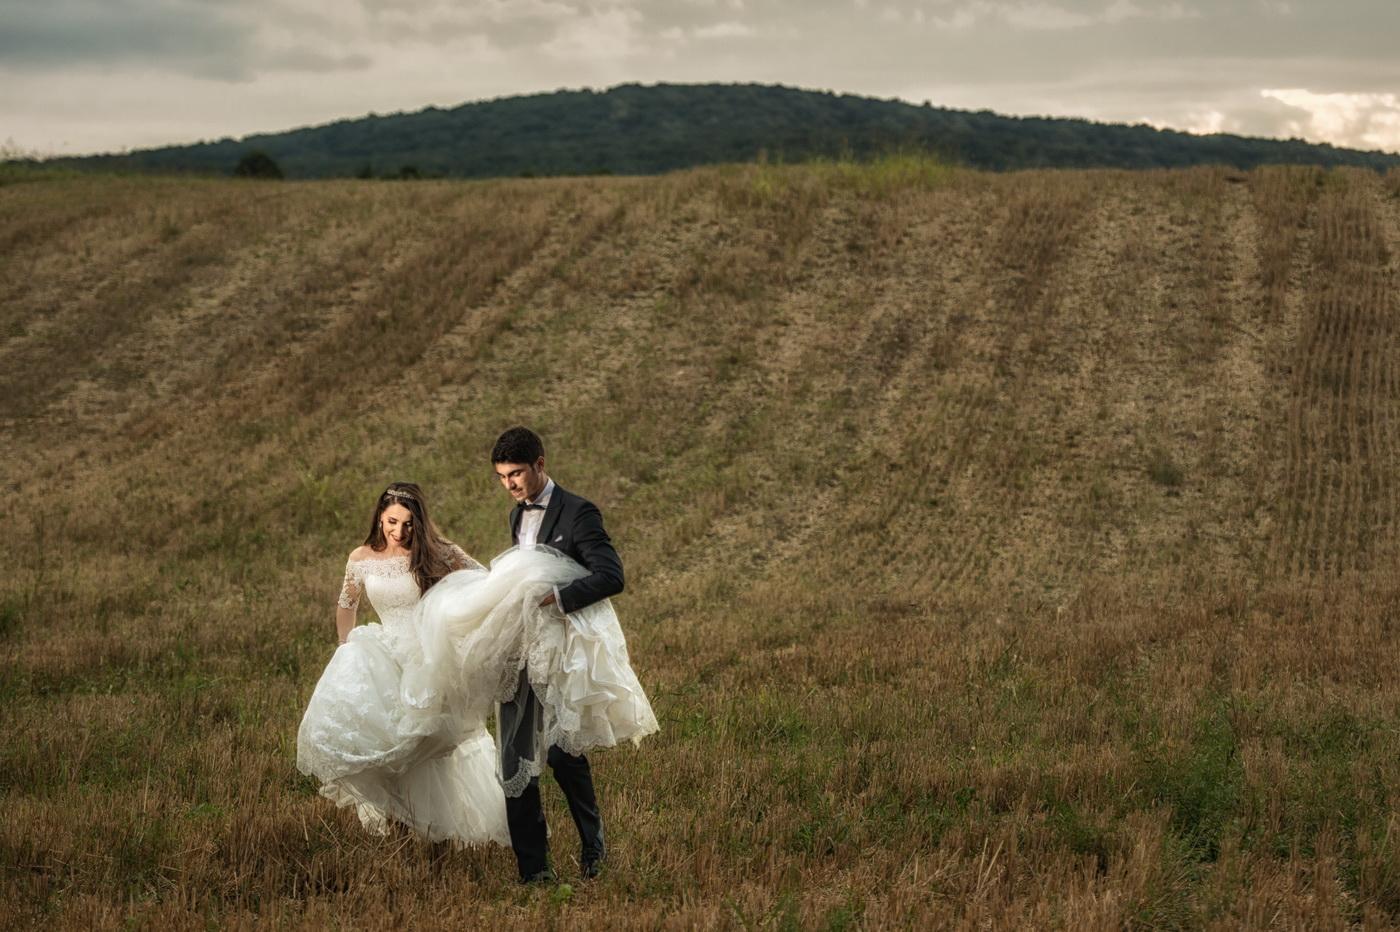 Destination Wedding Photographer_Marian Sterea_135.jpg